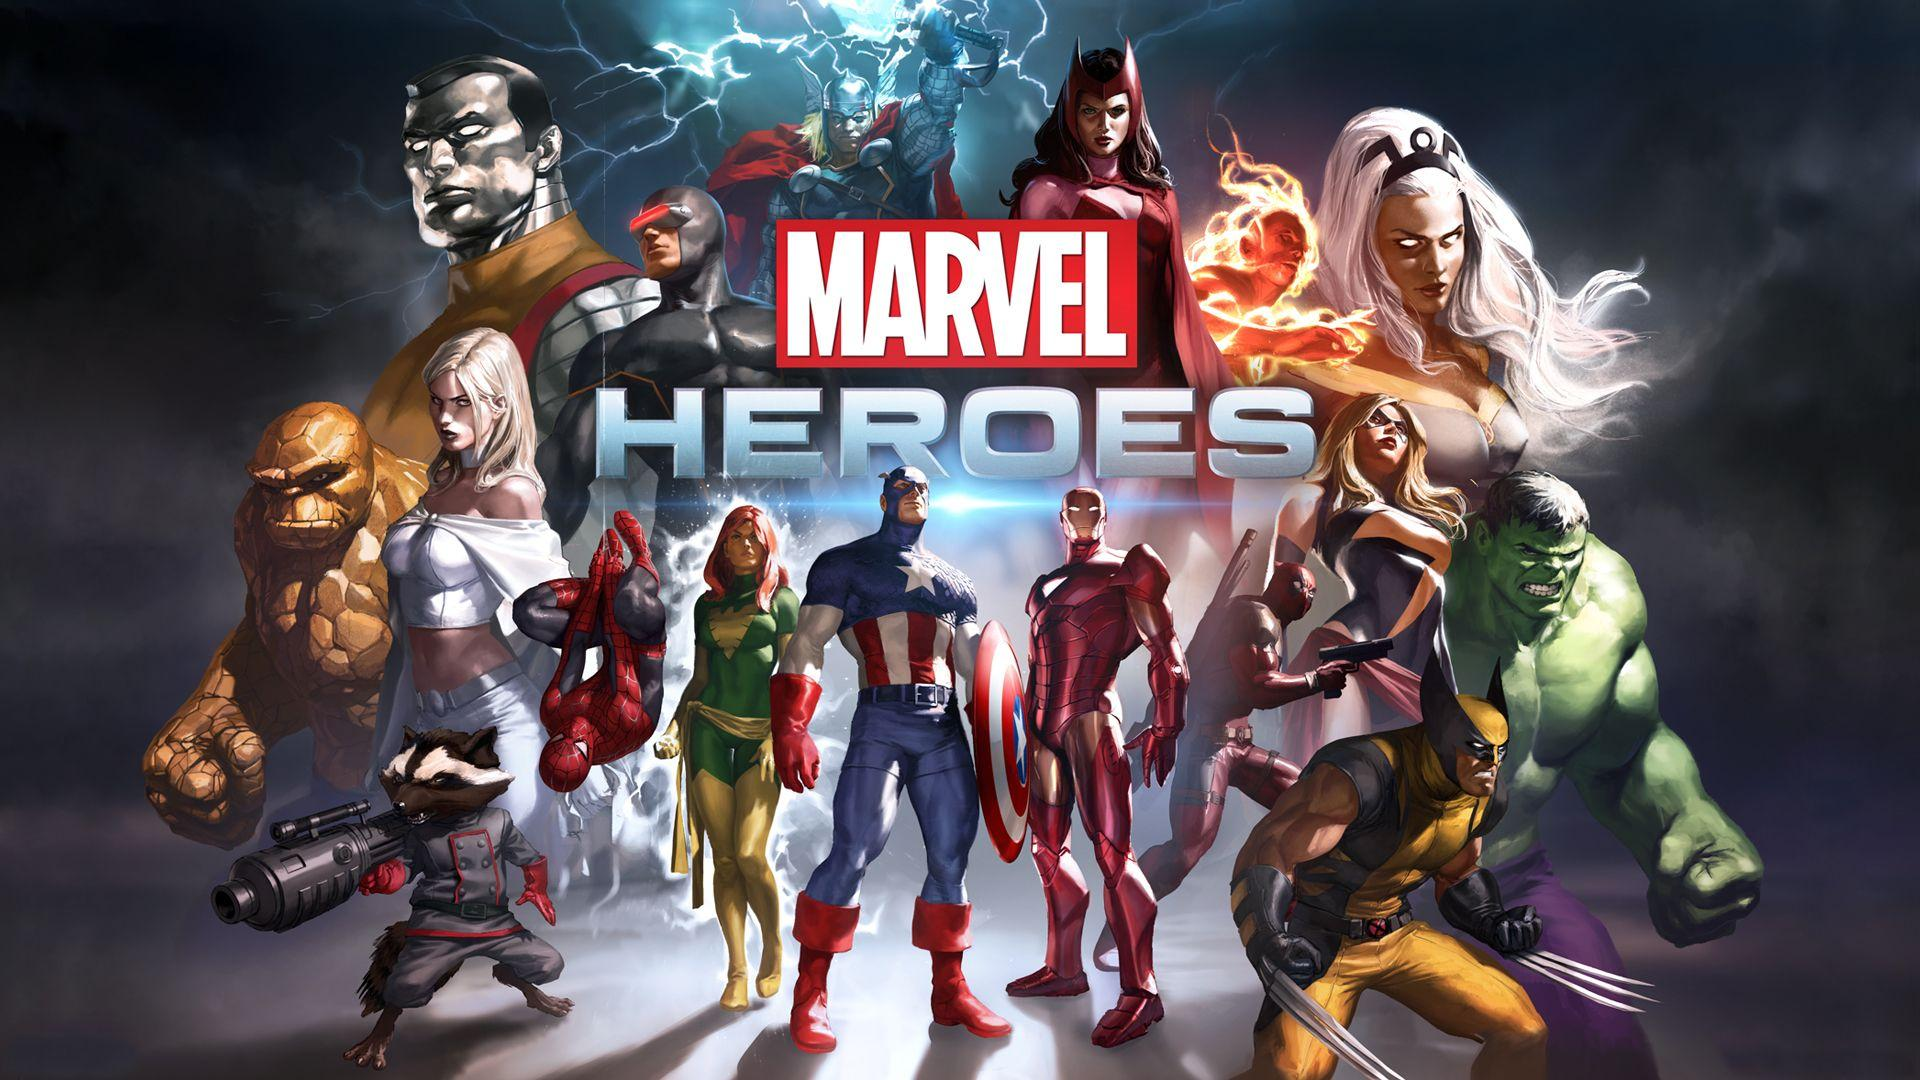 Marvel Heroes Hd Wallpapers Wallpaper Cave